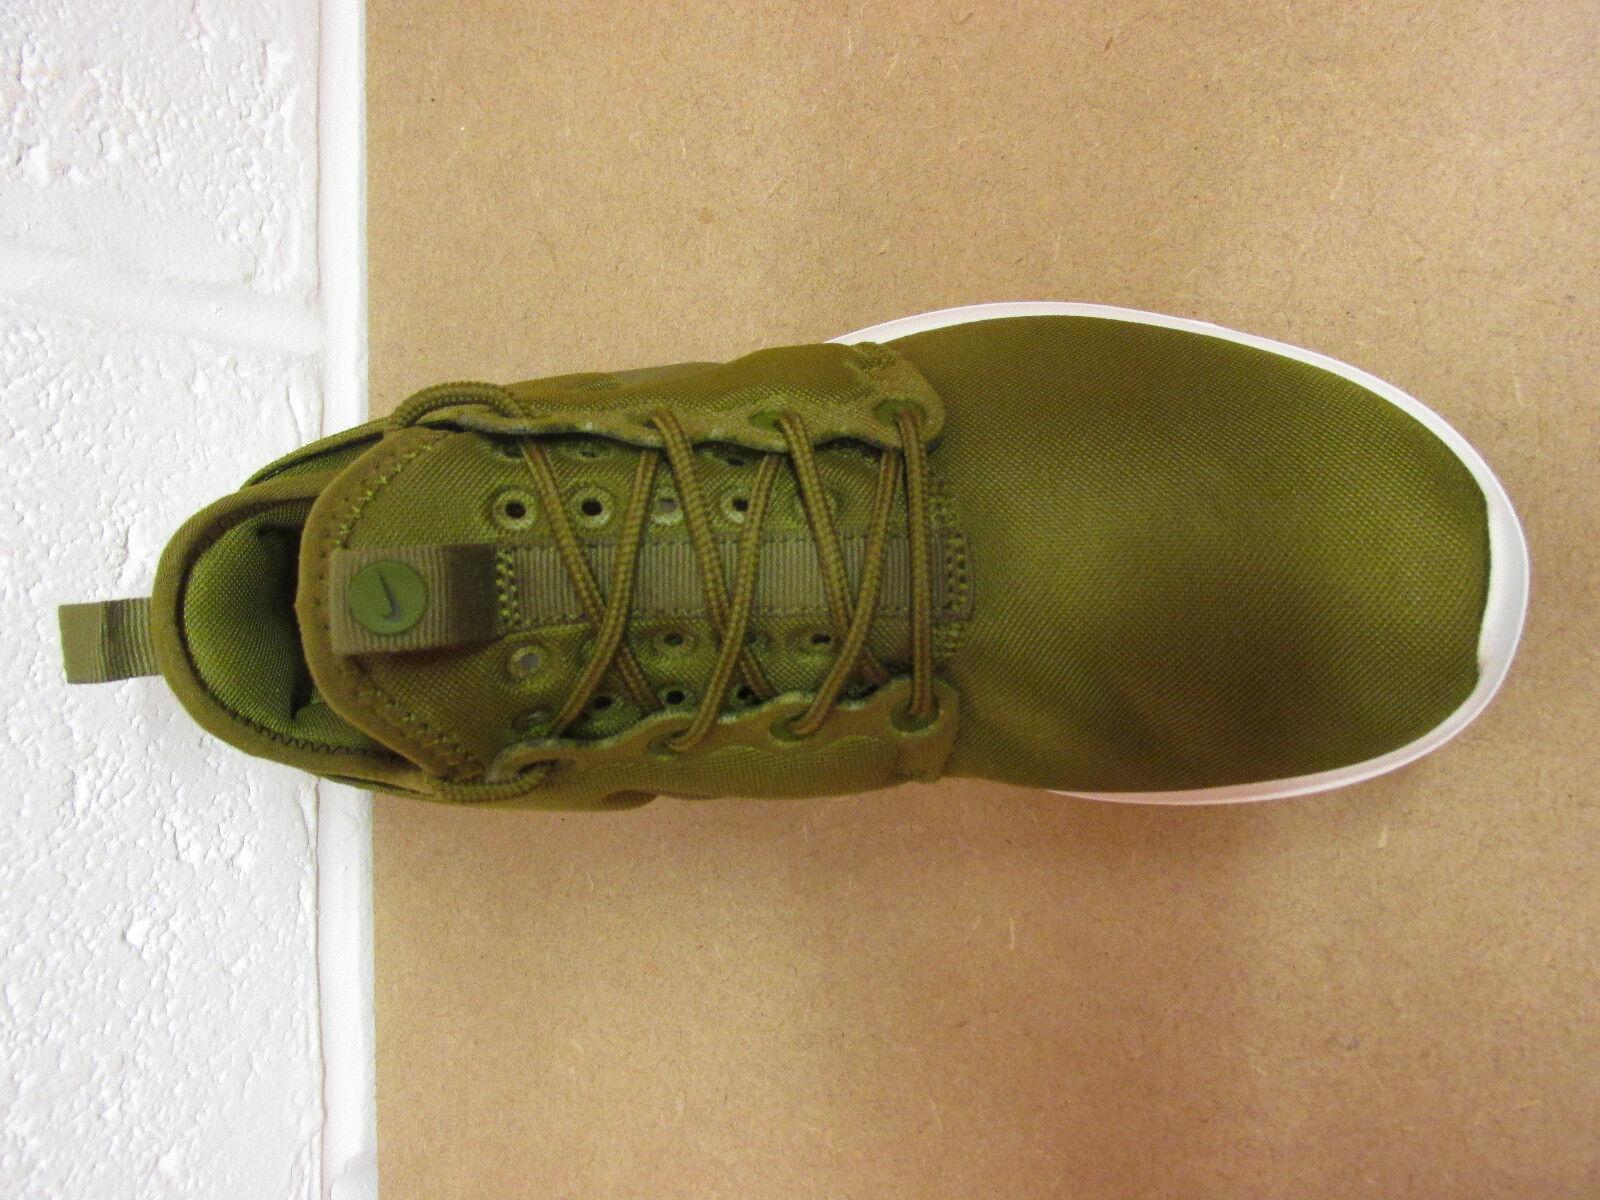 Nike Damenschuhe Roshe Trainers Two Running Trainers Roshe 844931 300 Sneakers Schuhes 822851